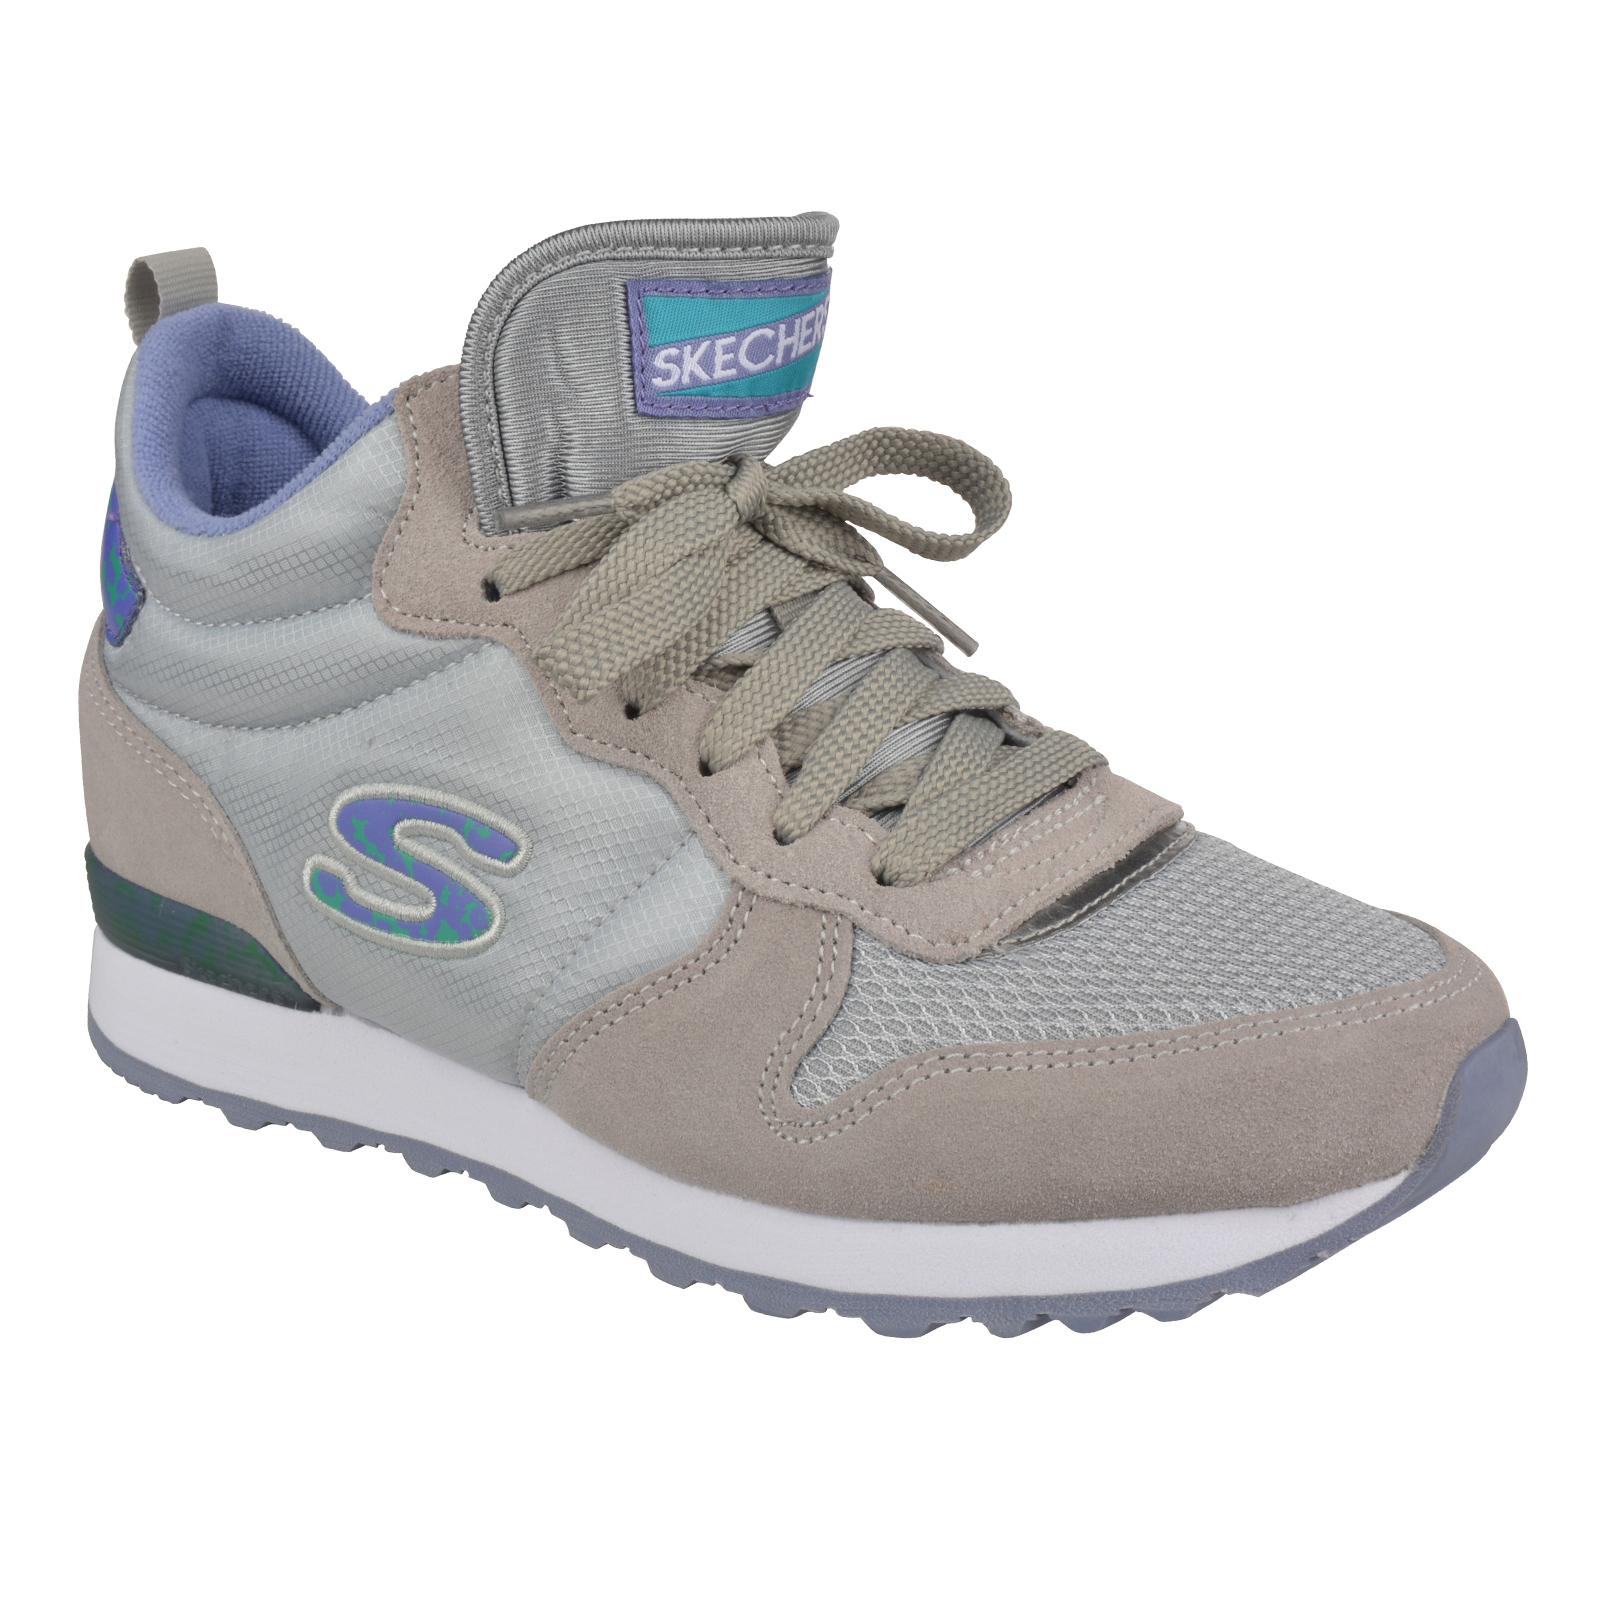 SKECHERS Damen Sneakers Turnschuhe Slipper Loafer